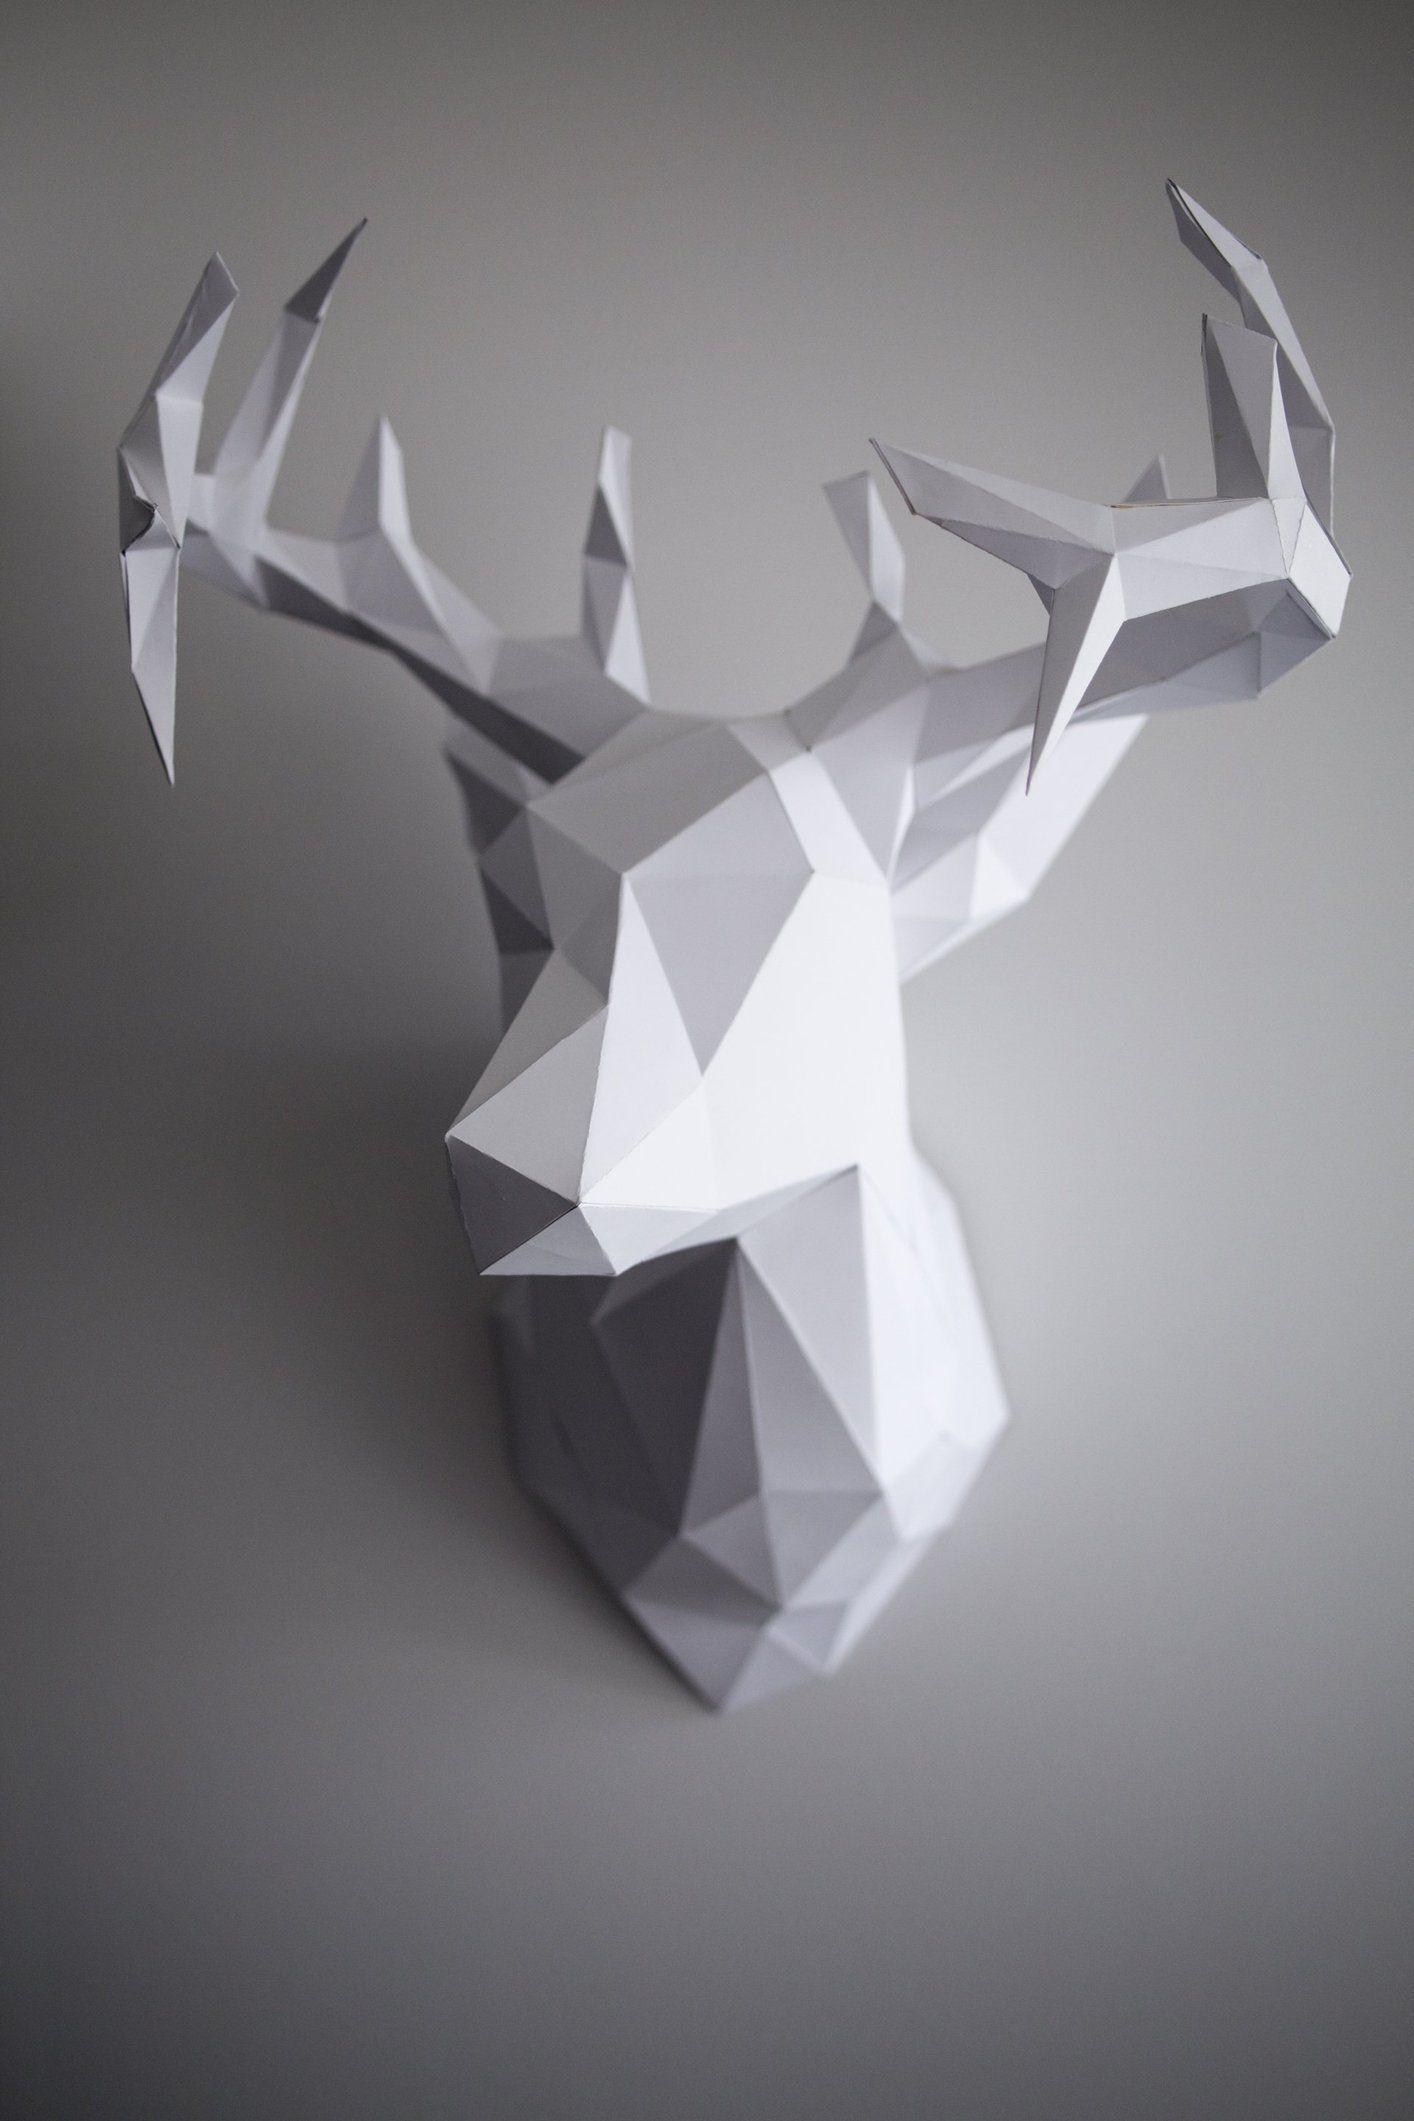 diy 3d paper reindeer head just in time for christmas. Black Bedroom Furniture Sets. Home Design Ideas